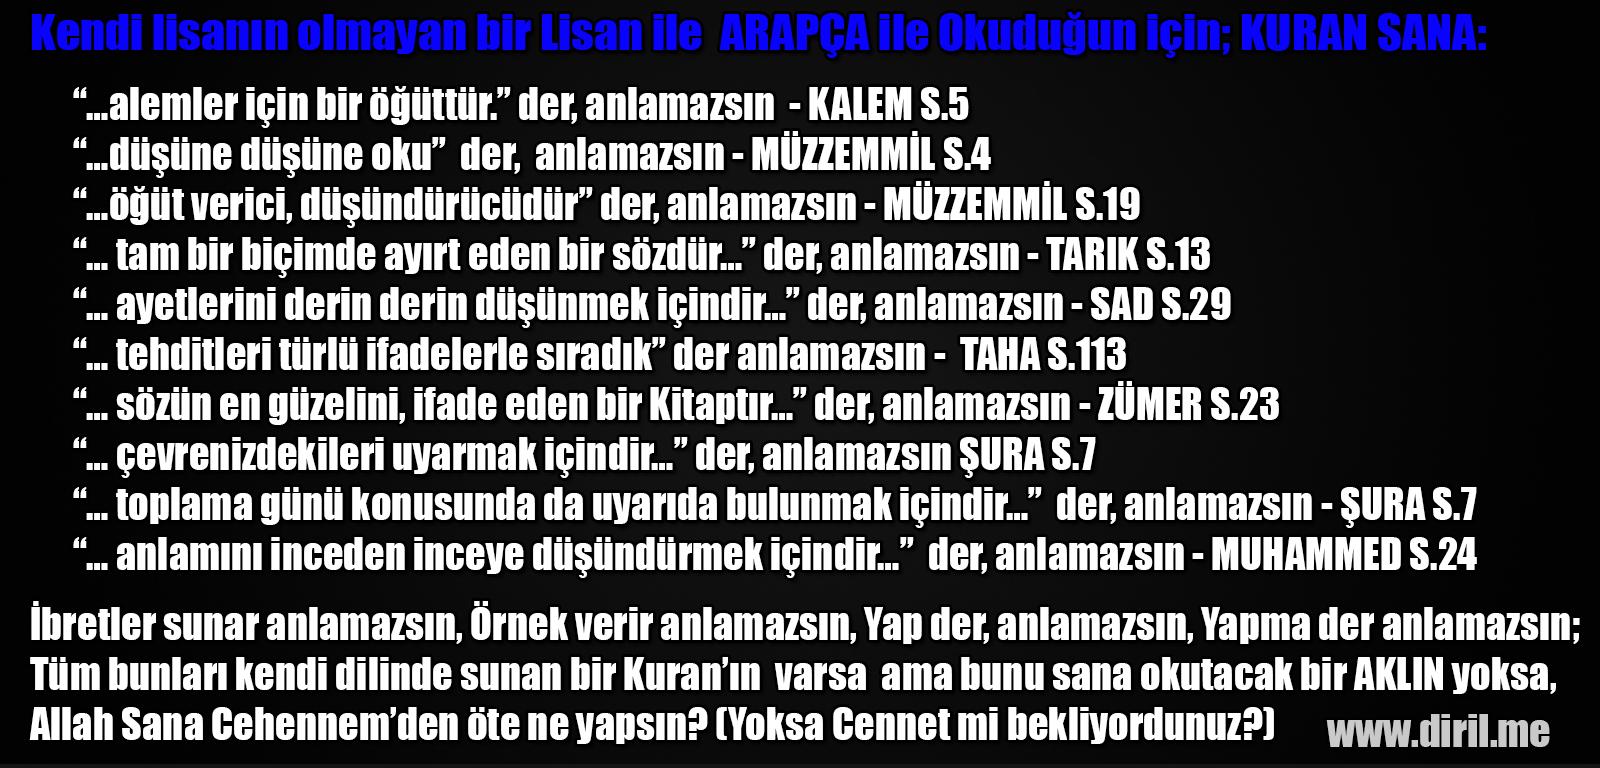 2013-07-03_AllahSana_1600x768